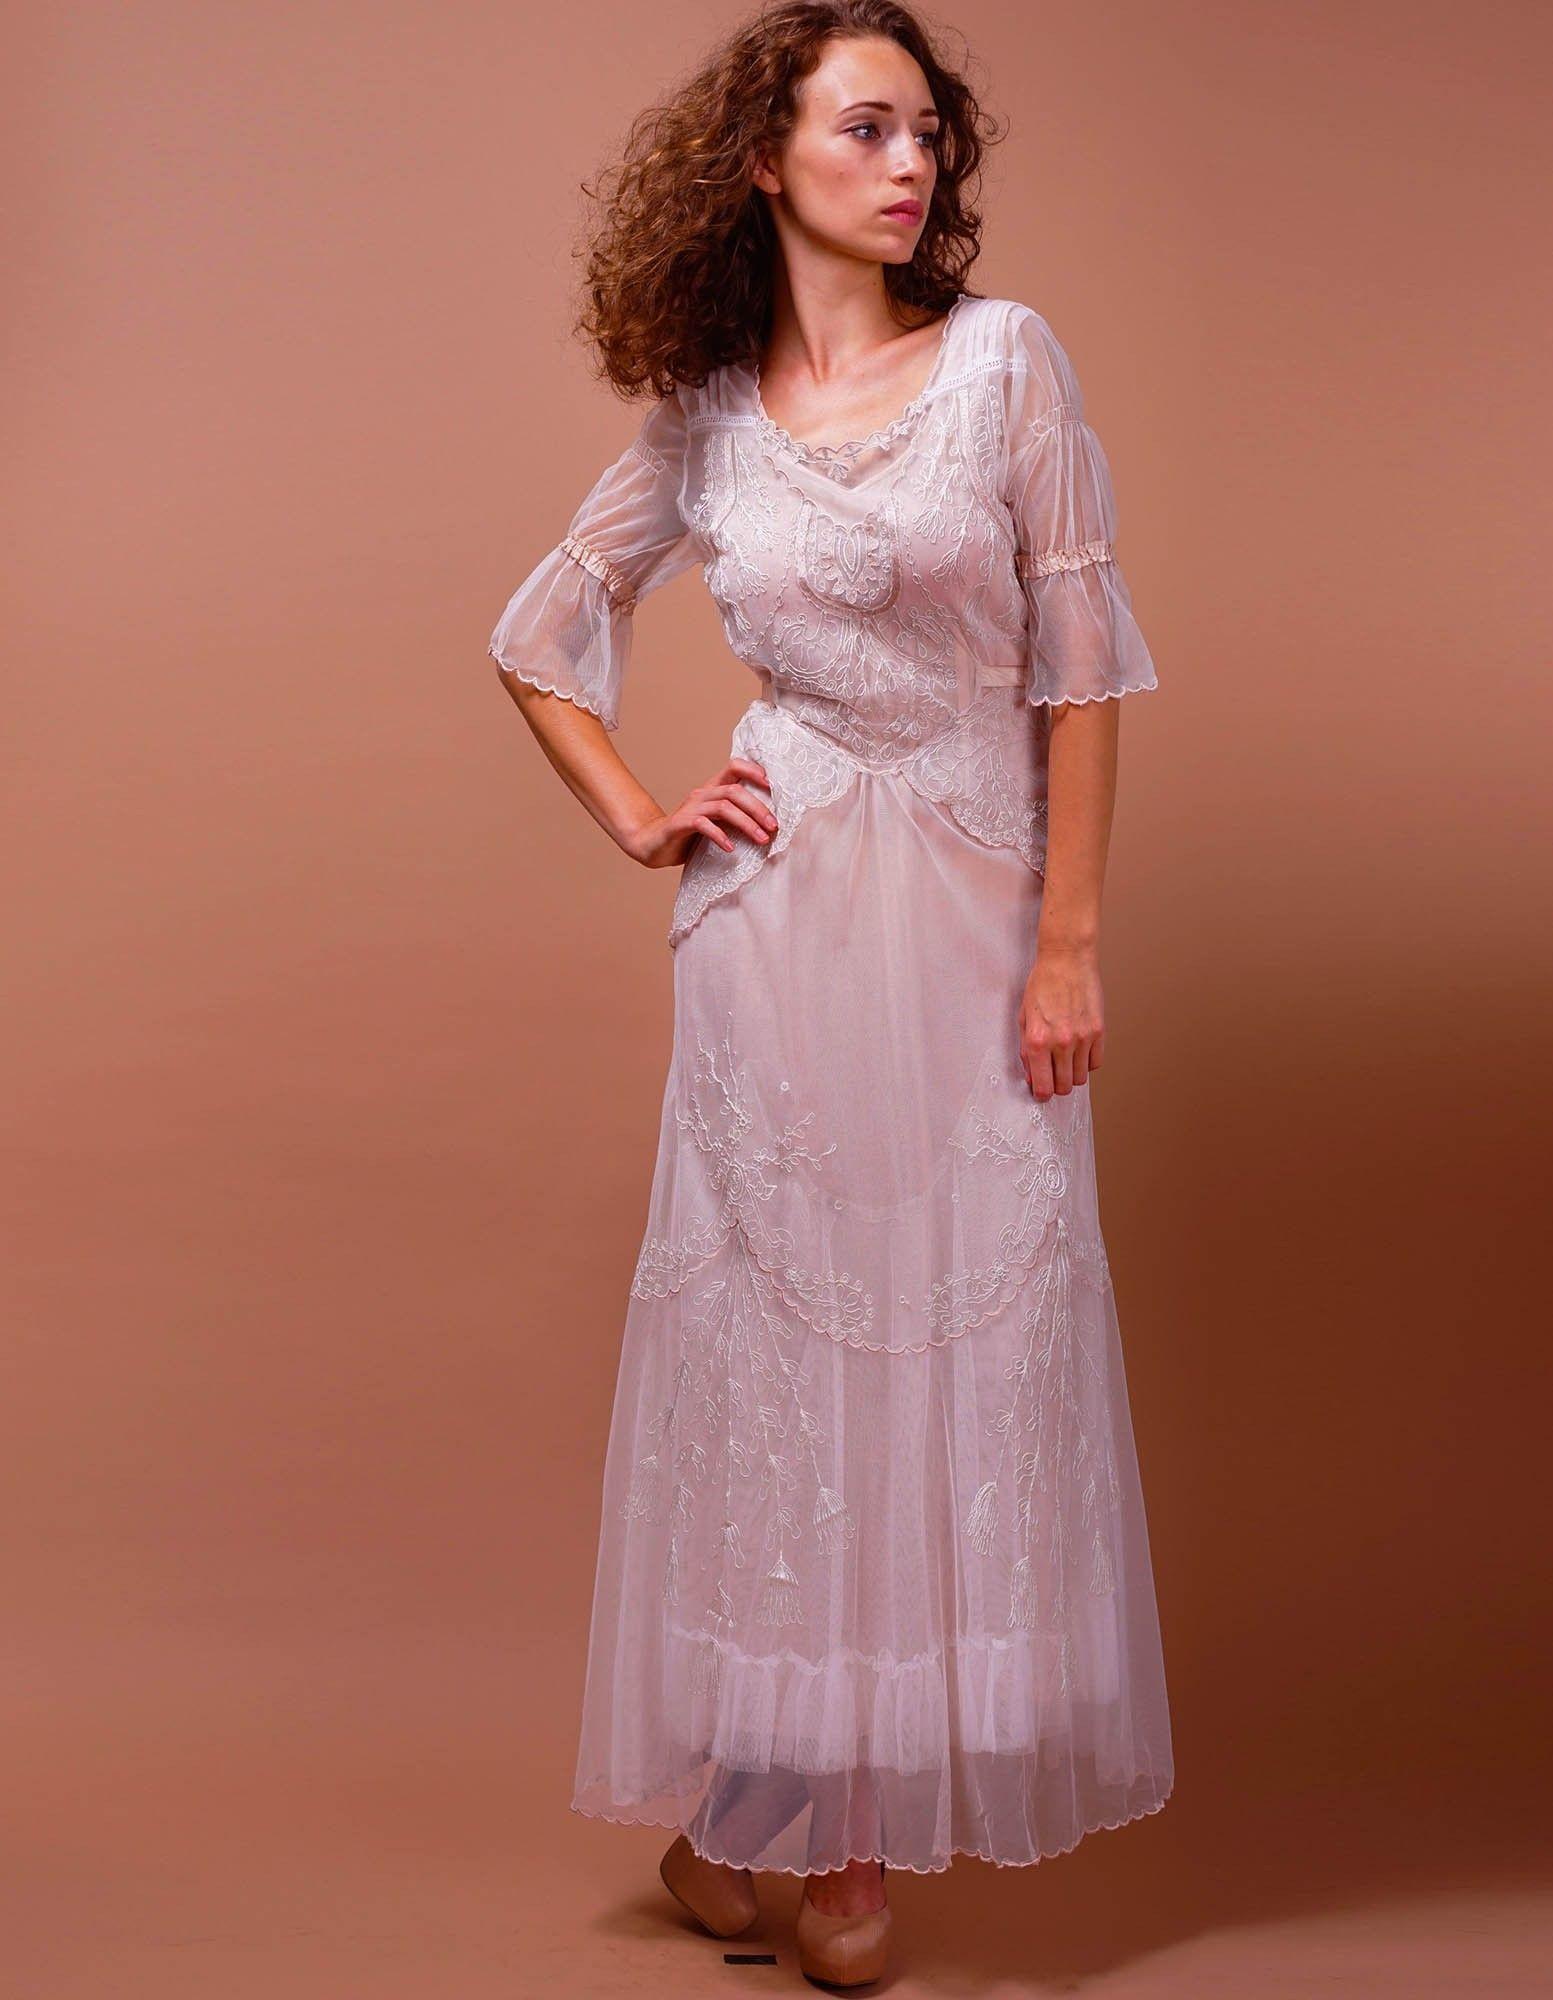 Edwardian Vintage Inspired Wedding Dress in Ivory/Blush by Nataya ...